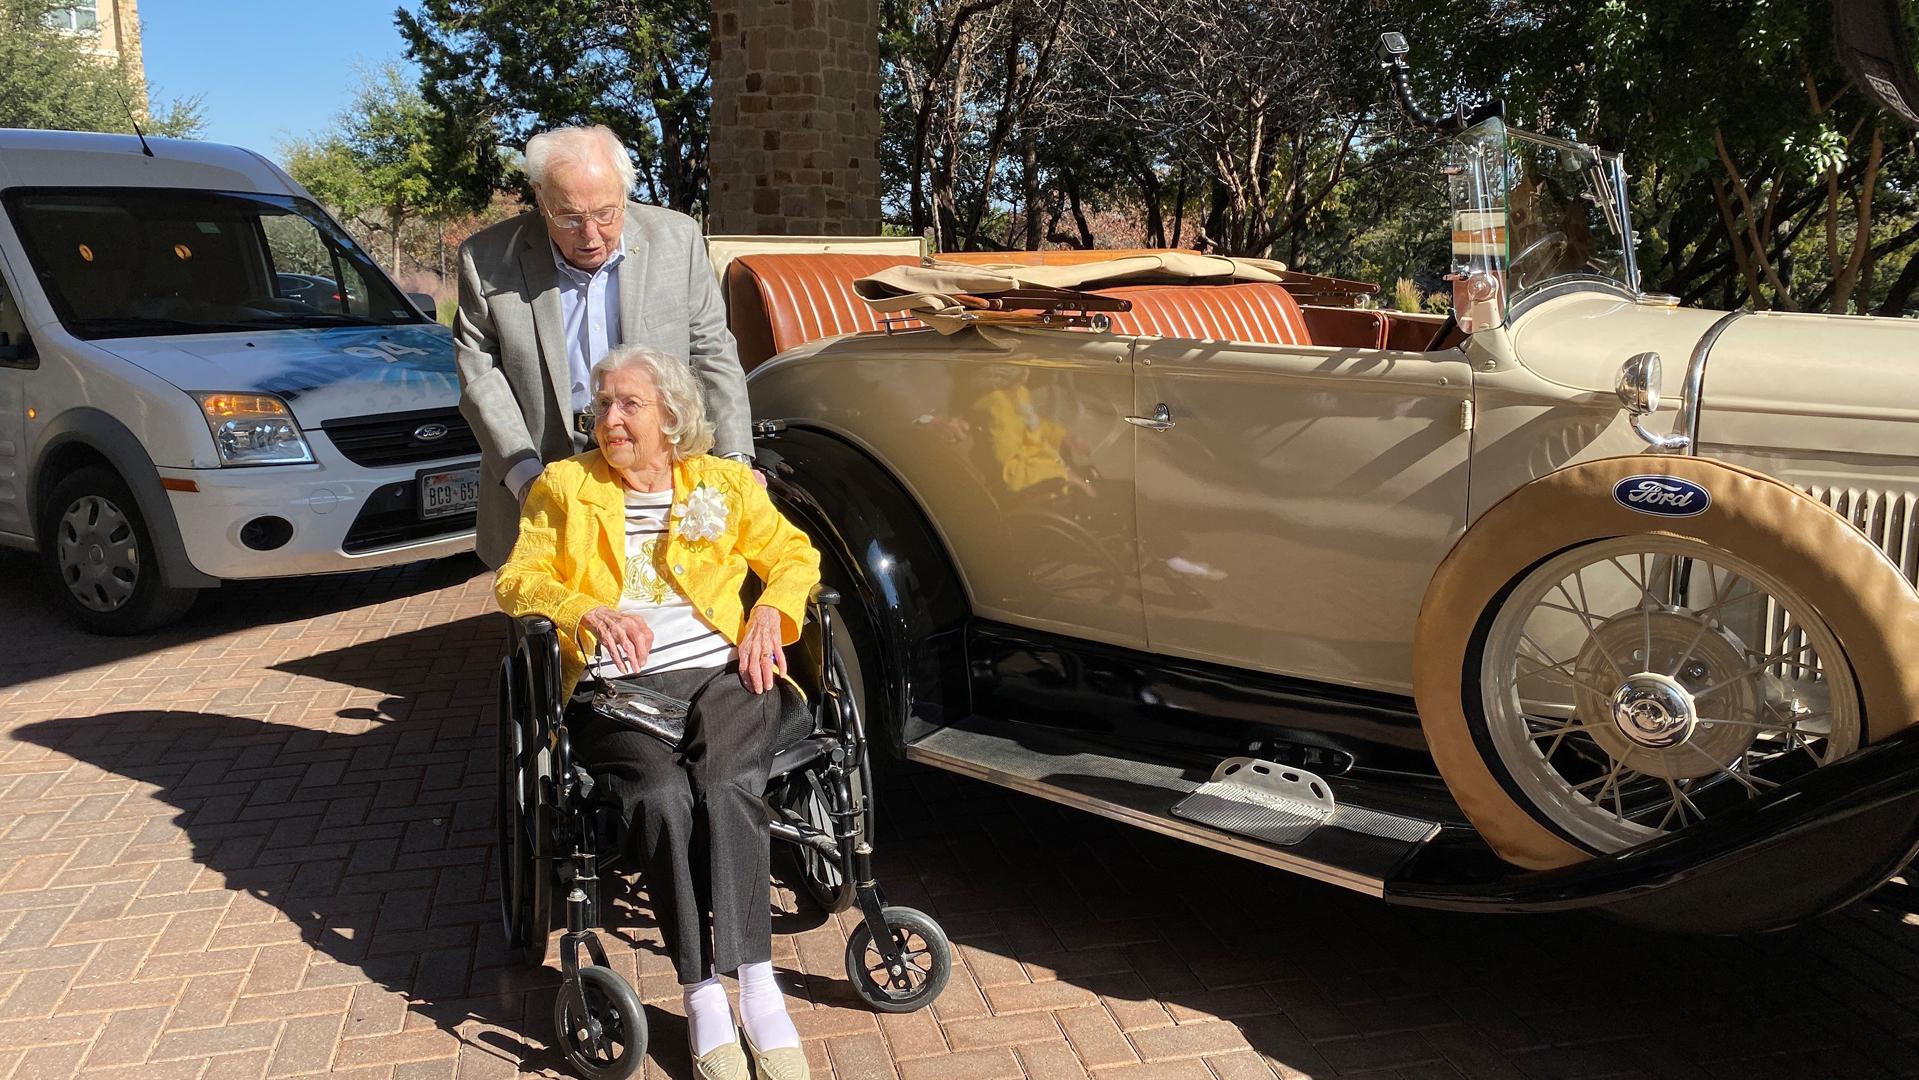 John Henderson, 106, picked up Charlotte Henderson, 105, in a 1920's Roadster to celebrate the major milestone. (Credit: Longhorn Village Senior Living Community)